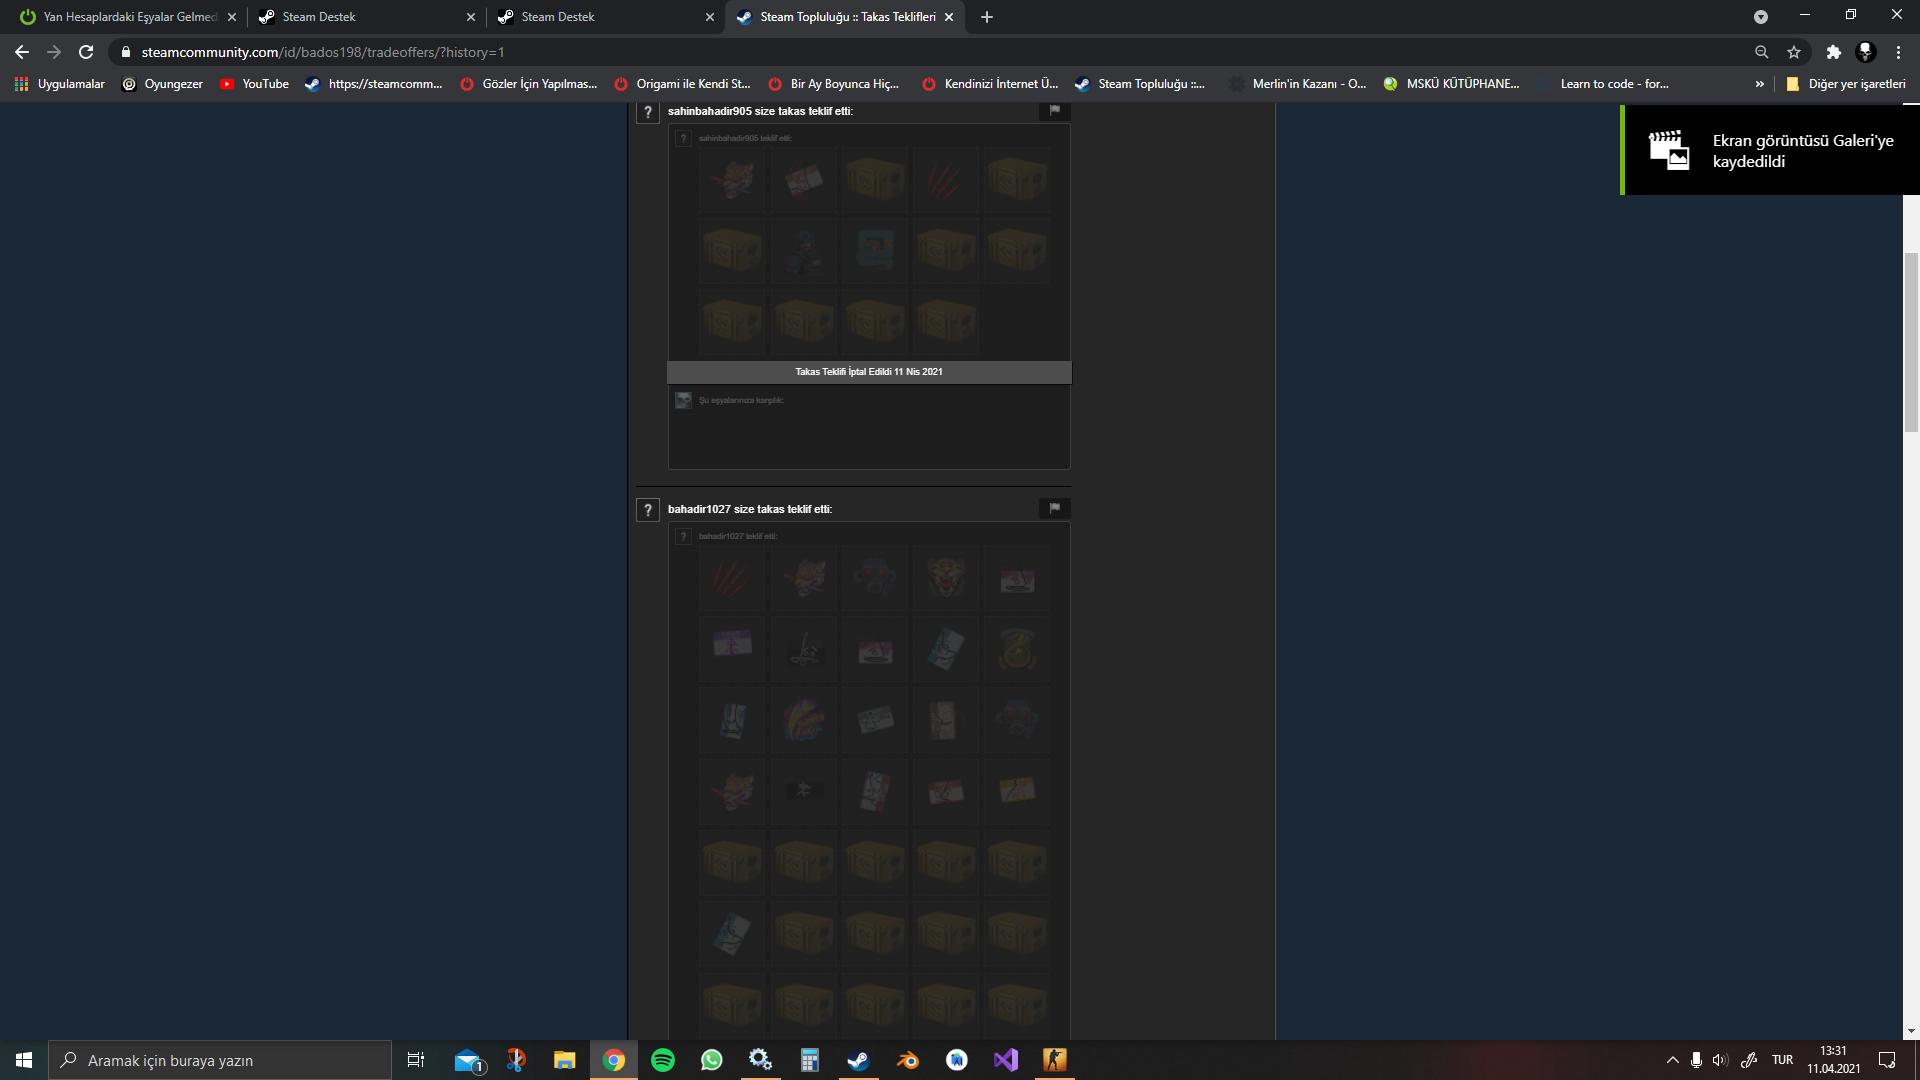 Desktop Screenshot 2021.04.11 - 13.31.01.33.png